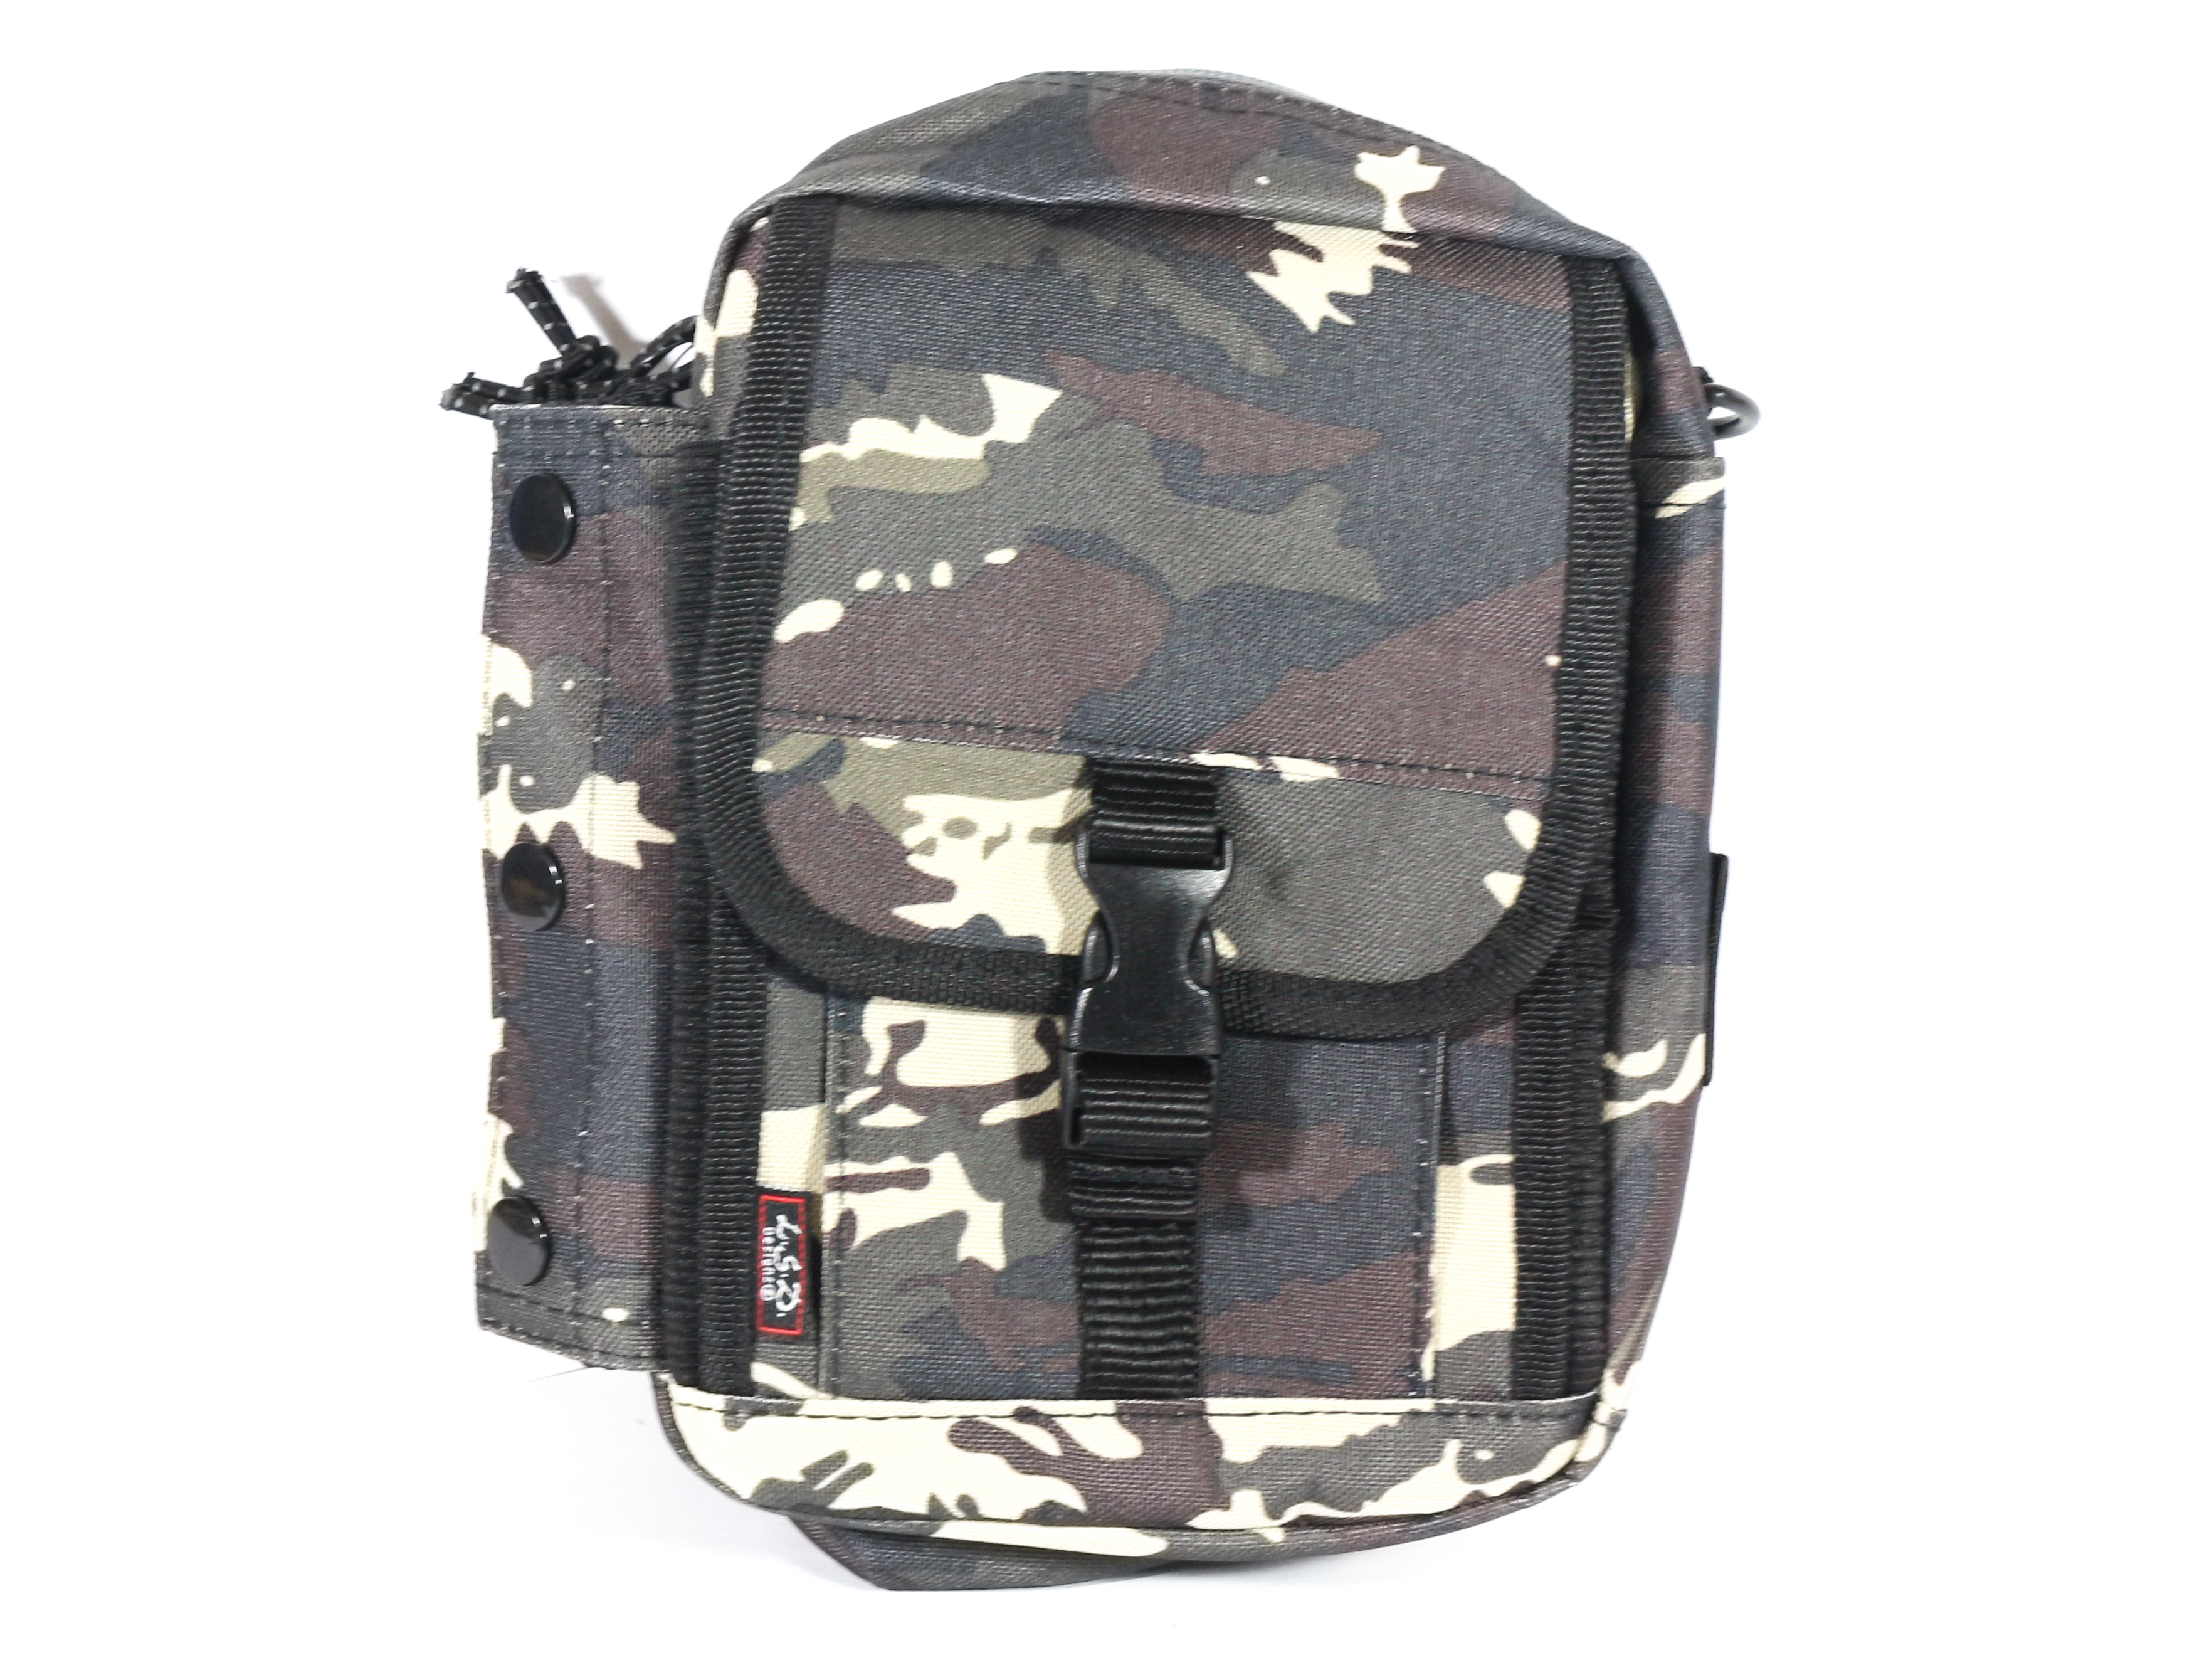 LSD Mini Shoulder Pac Sling Bag Camo 20 x 13 x 8 cm (8591)